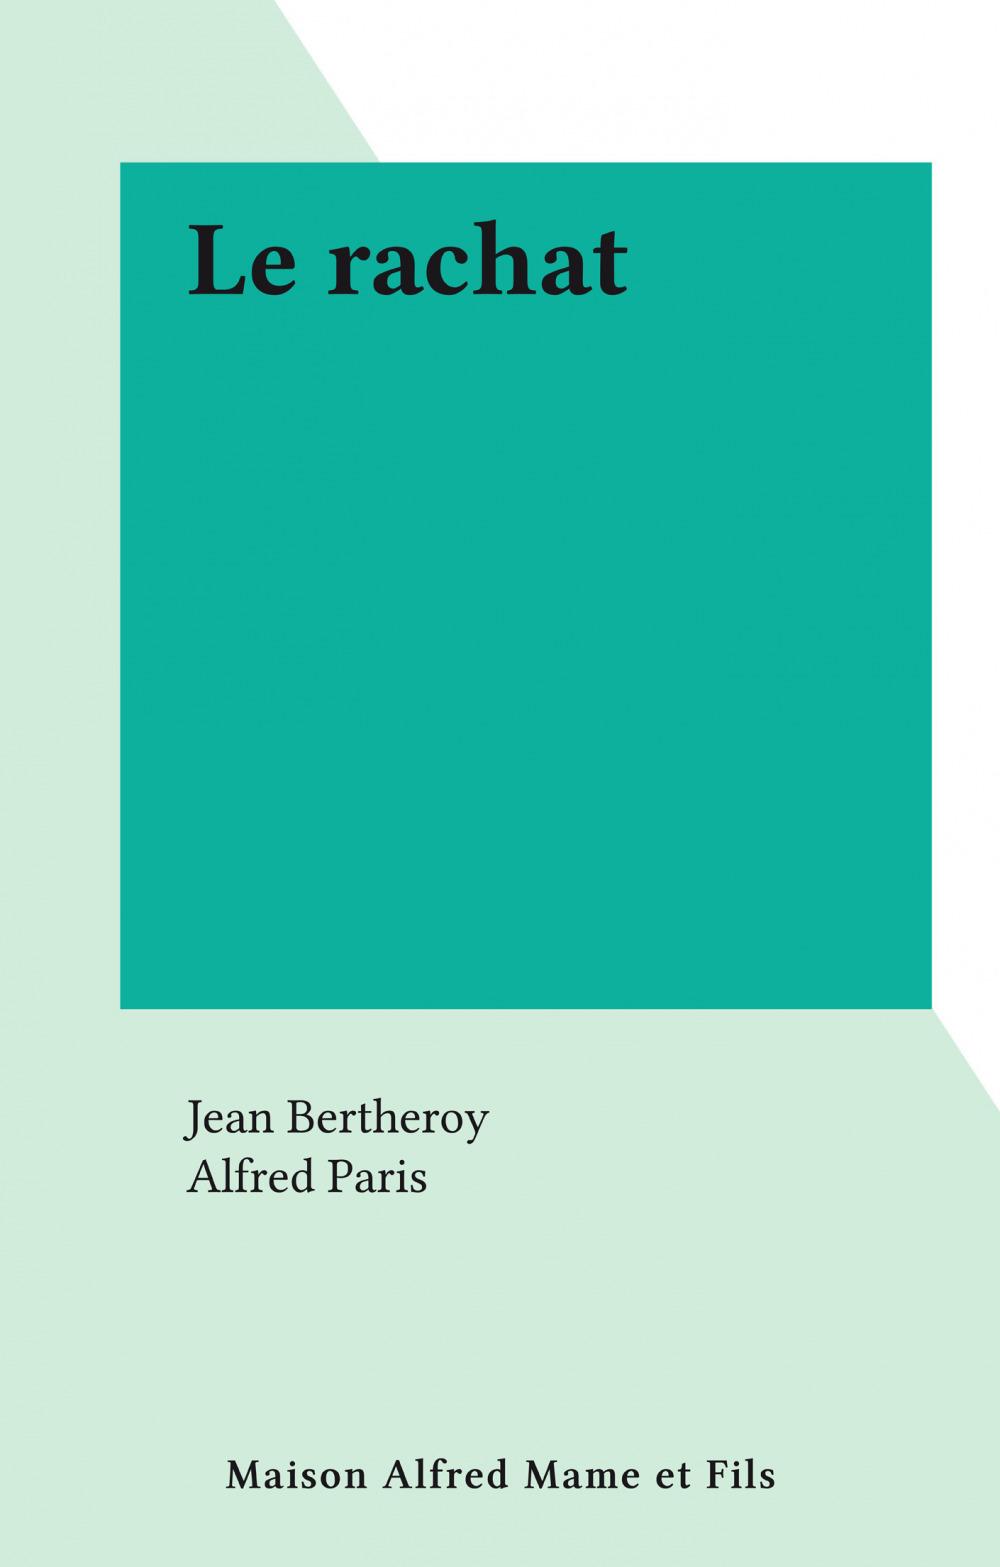 Le rachat  - Jean Bertheroy